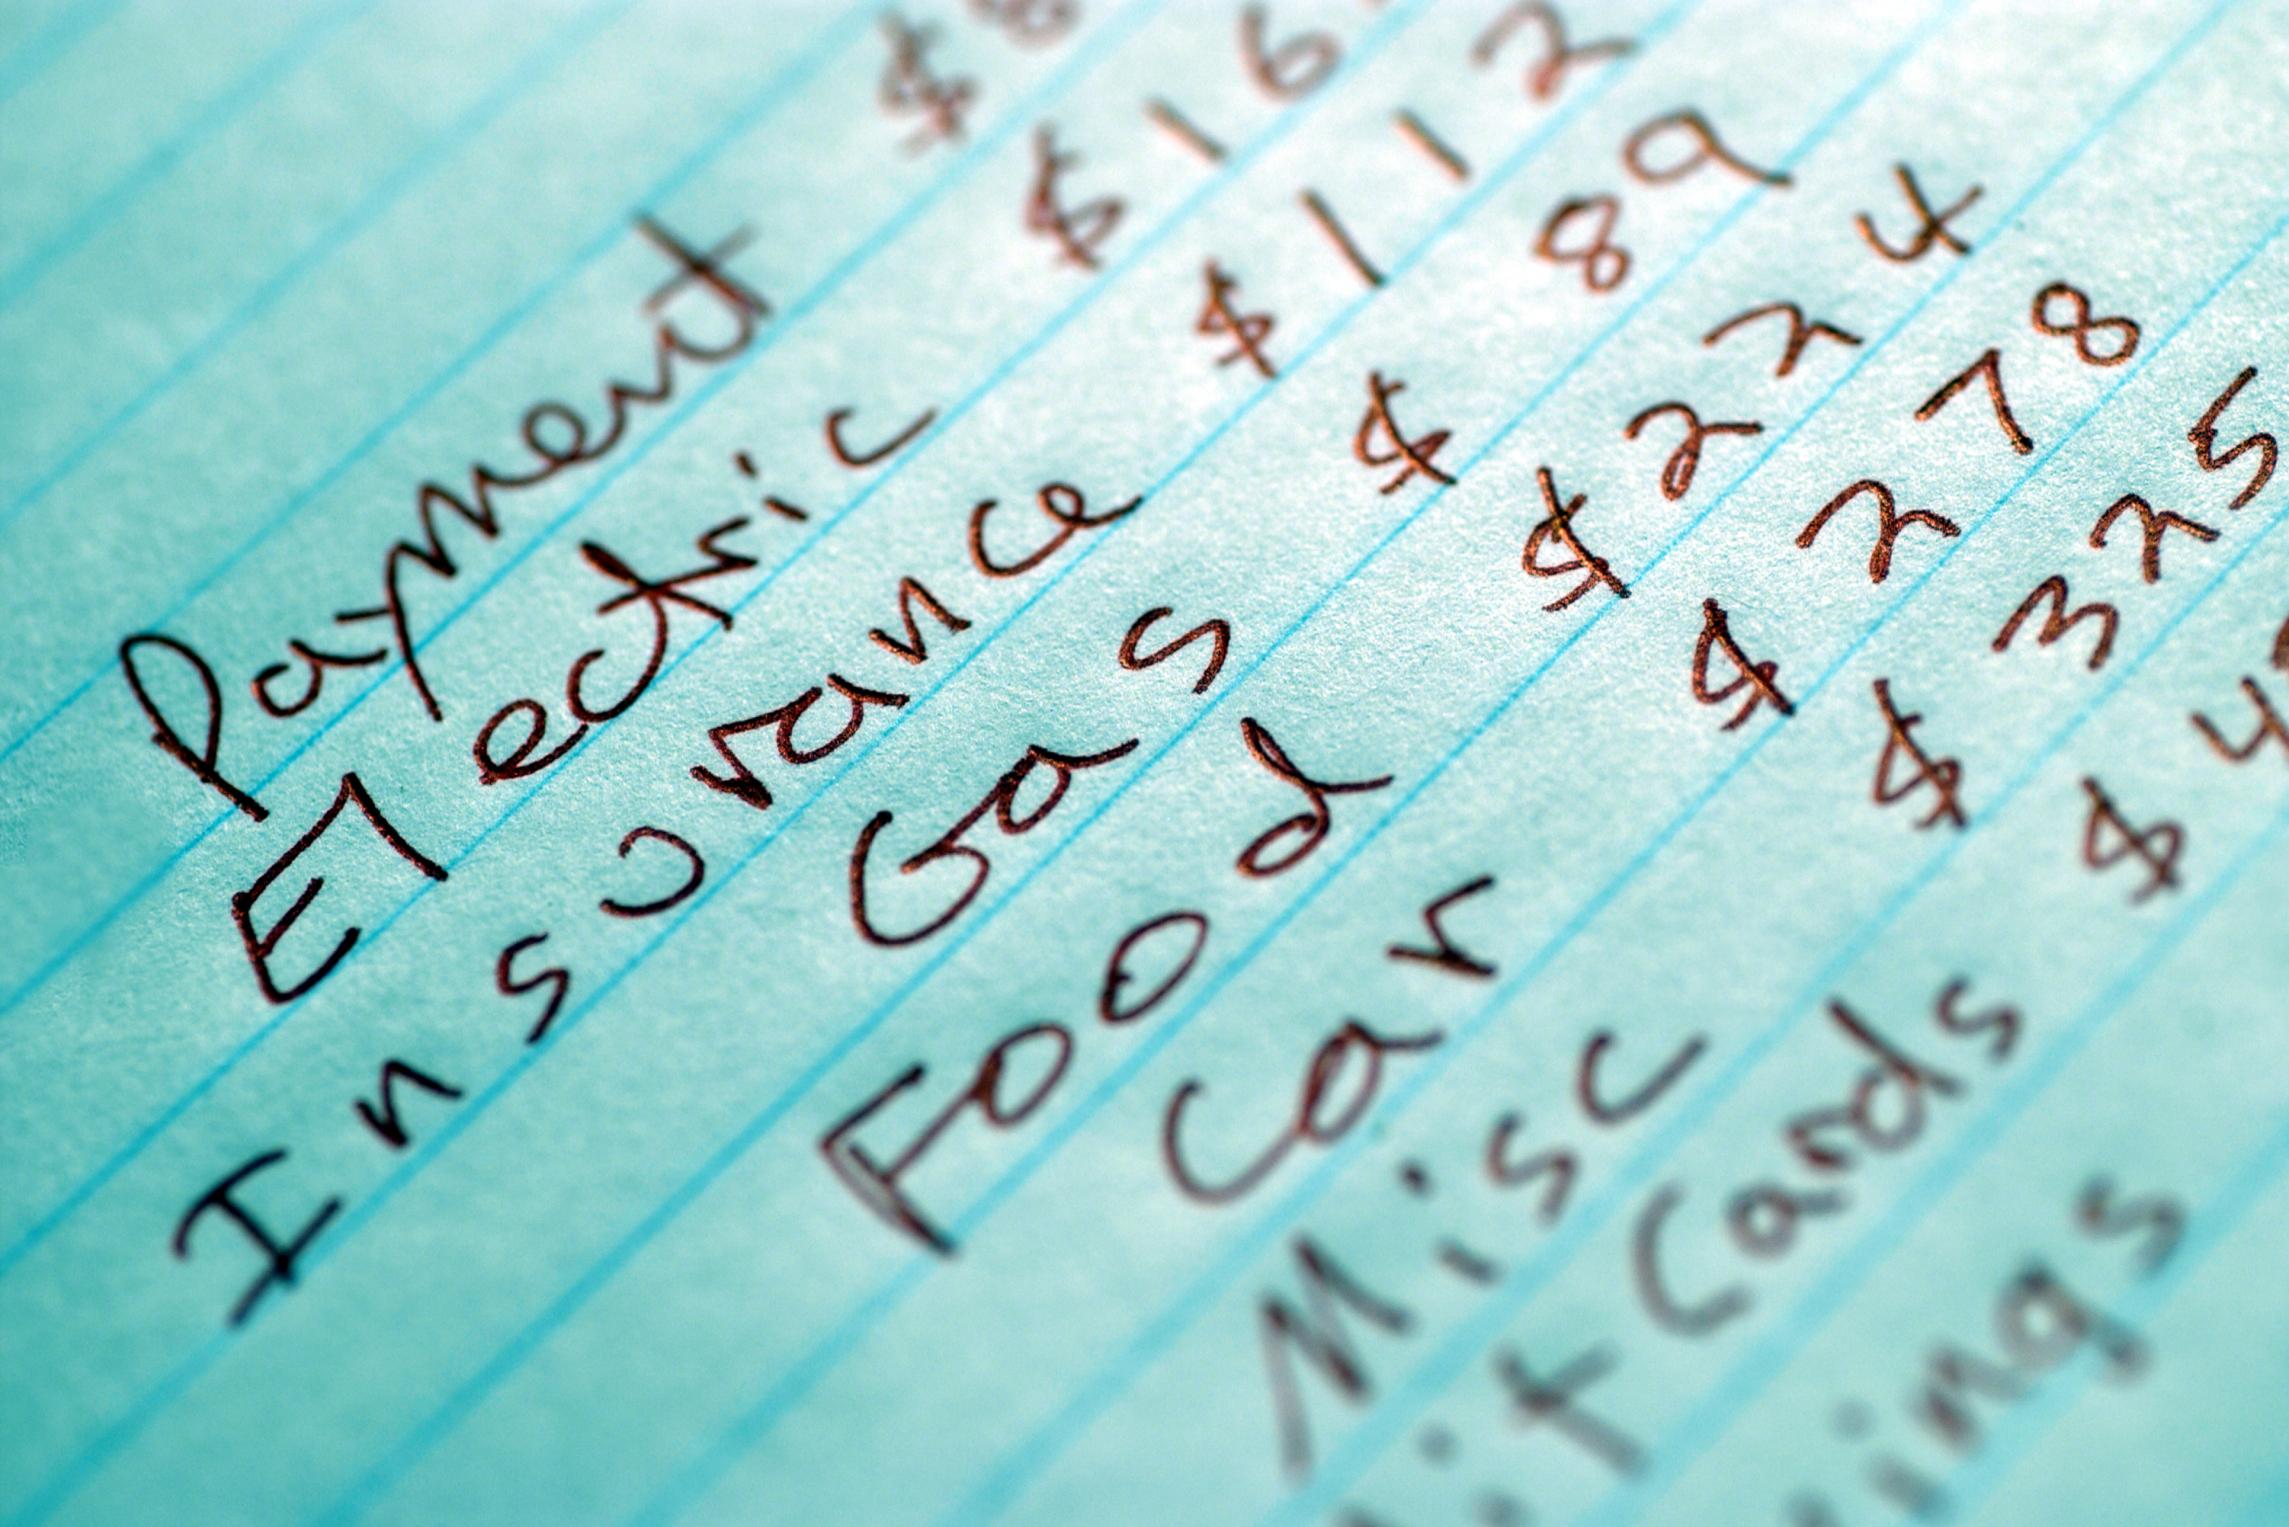 Basic Budget Plan for Low-Income Family | Pocket Sense